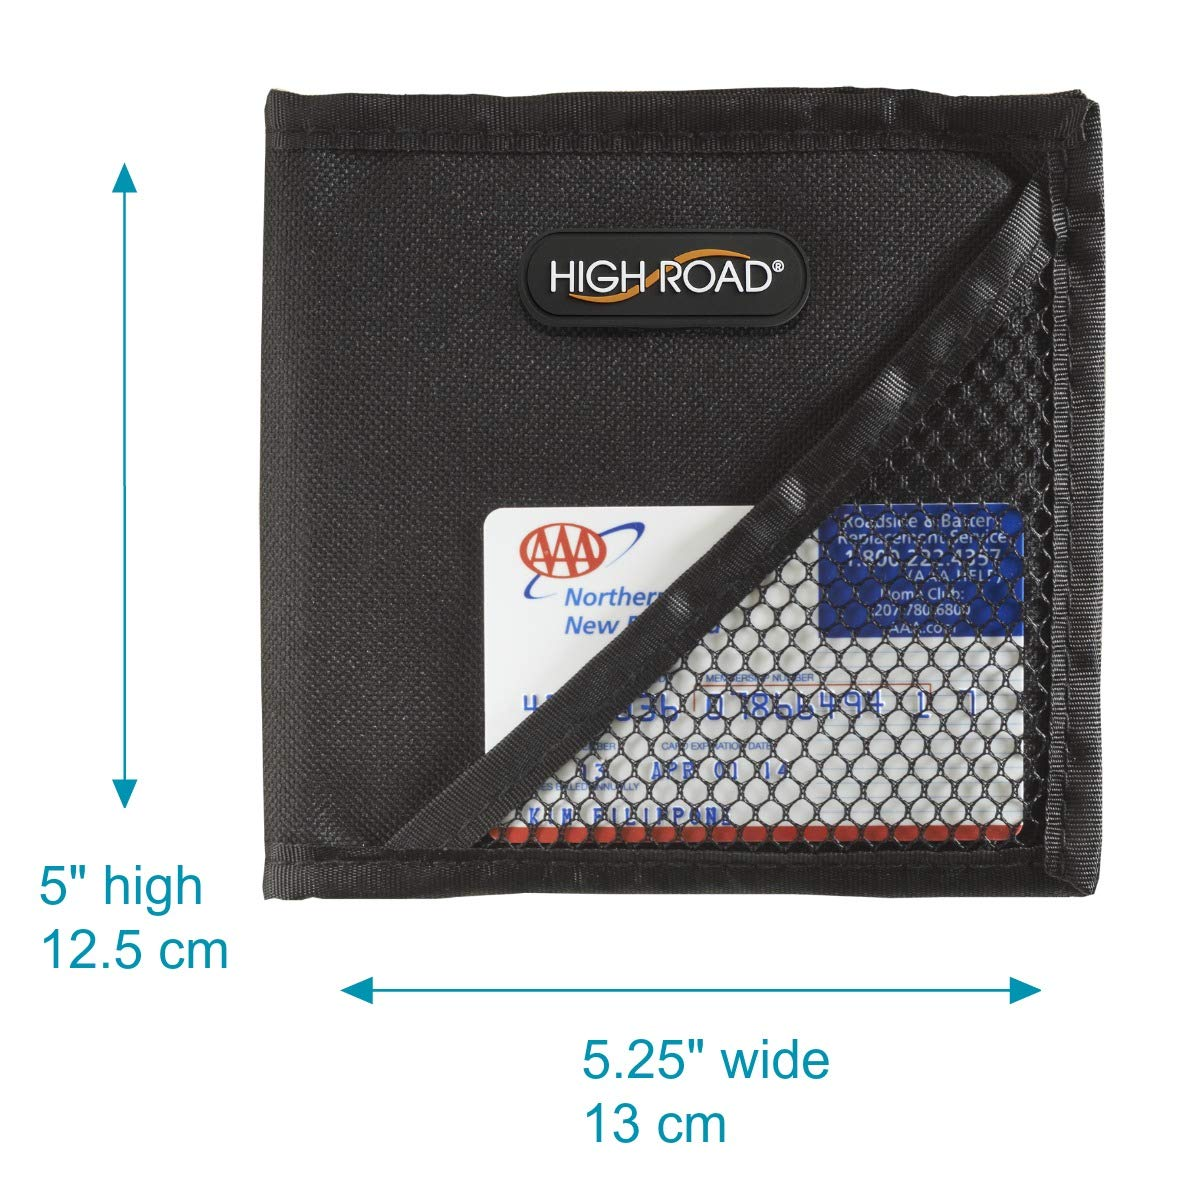 High Road Car Visor Organizer and Registration Wallet